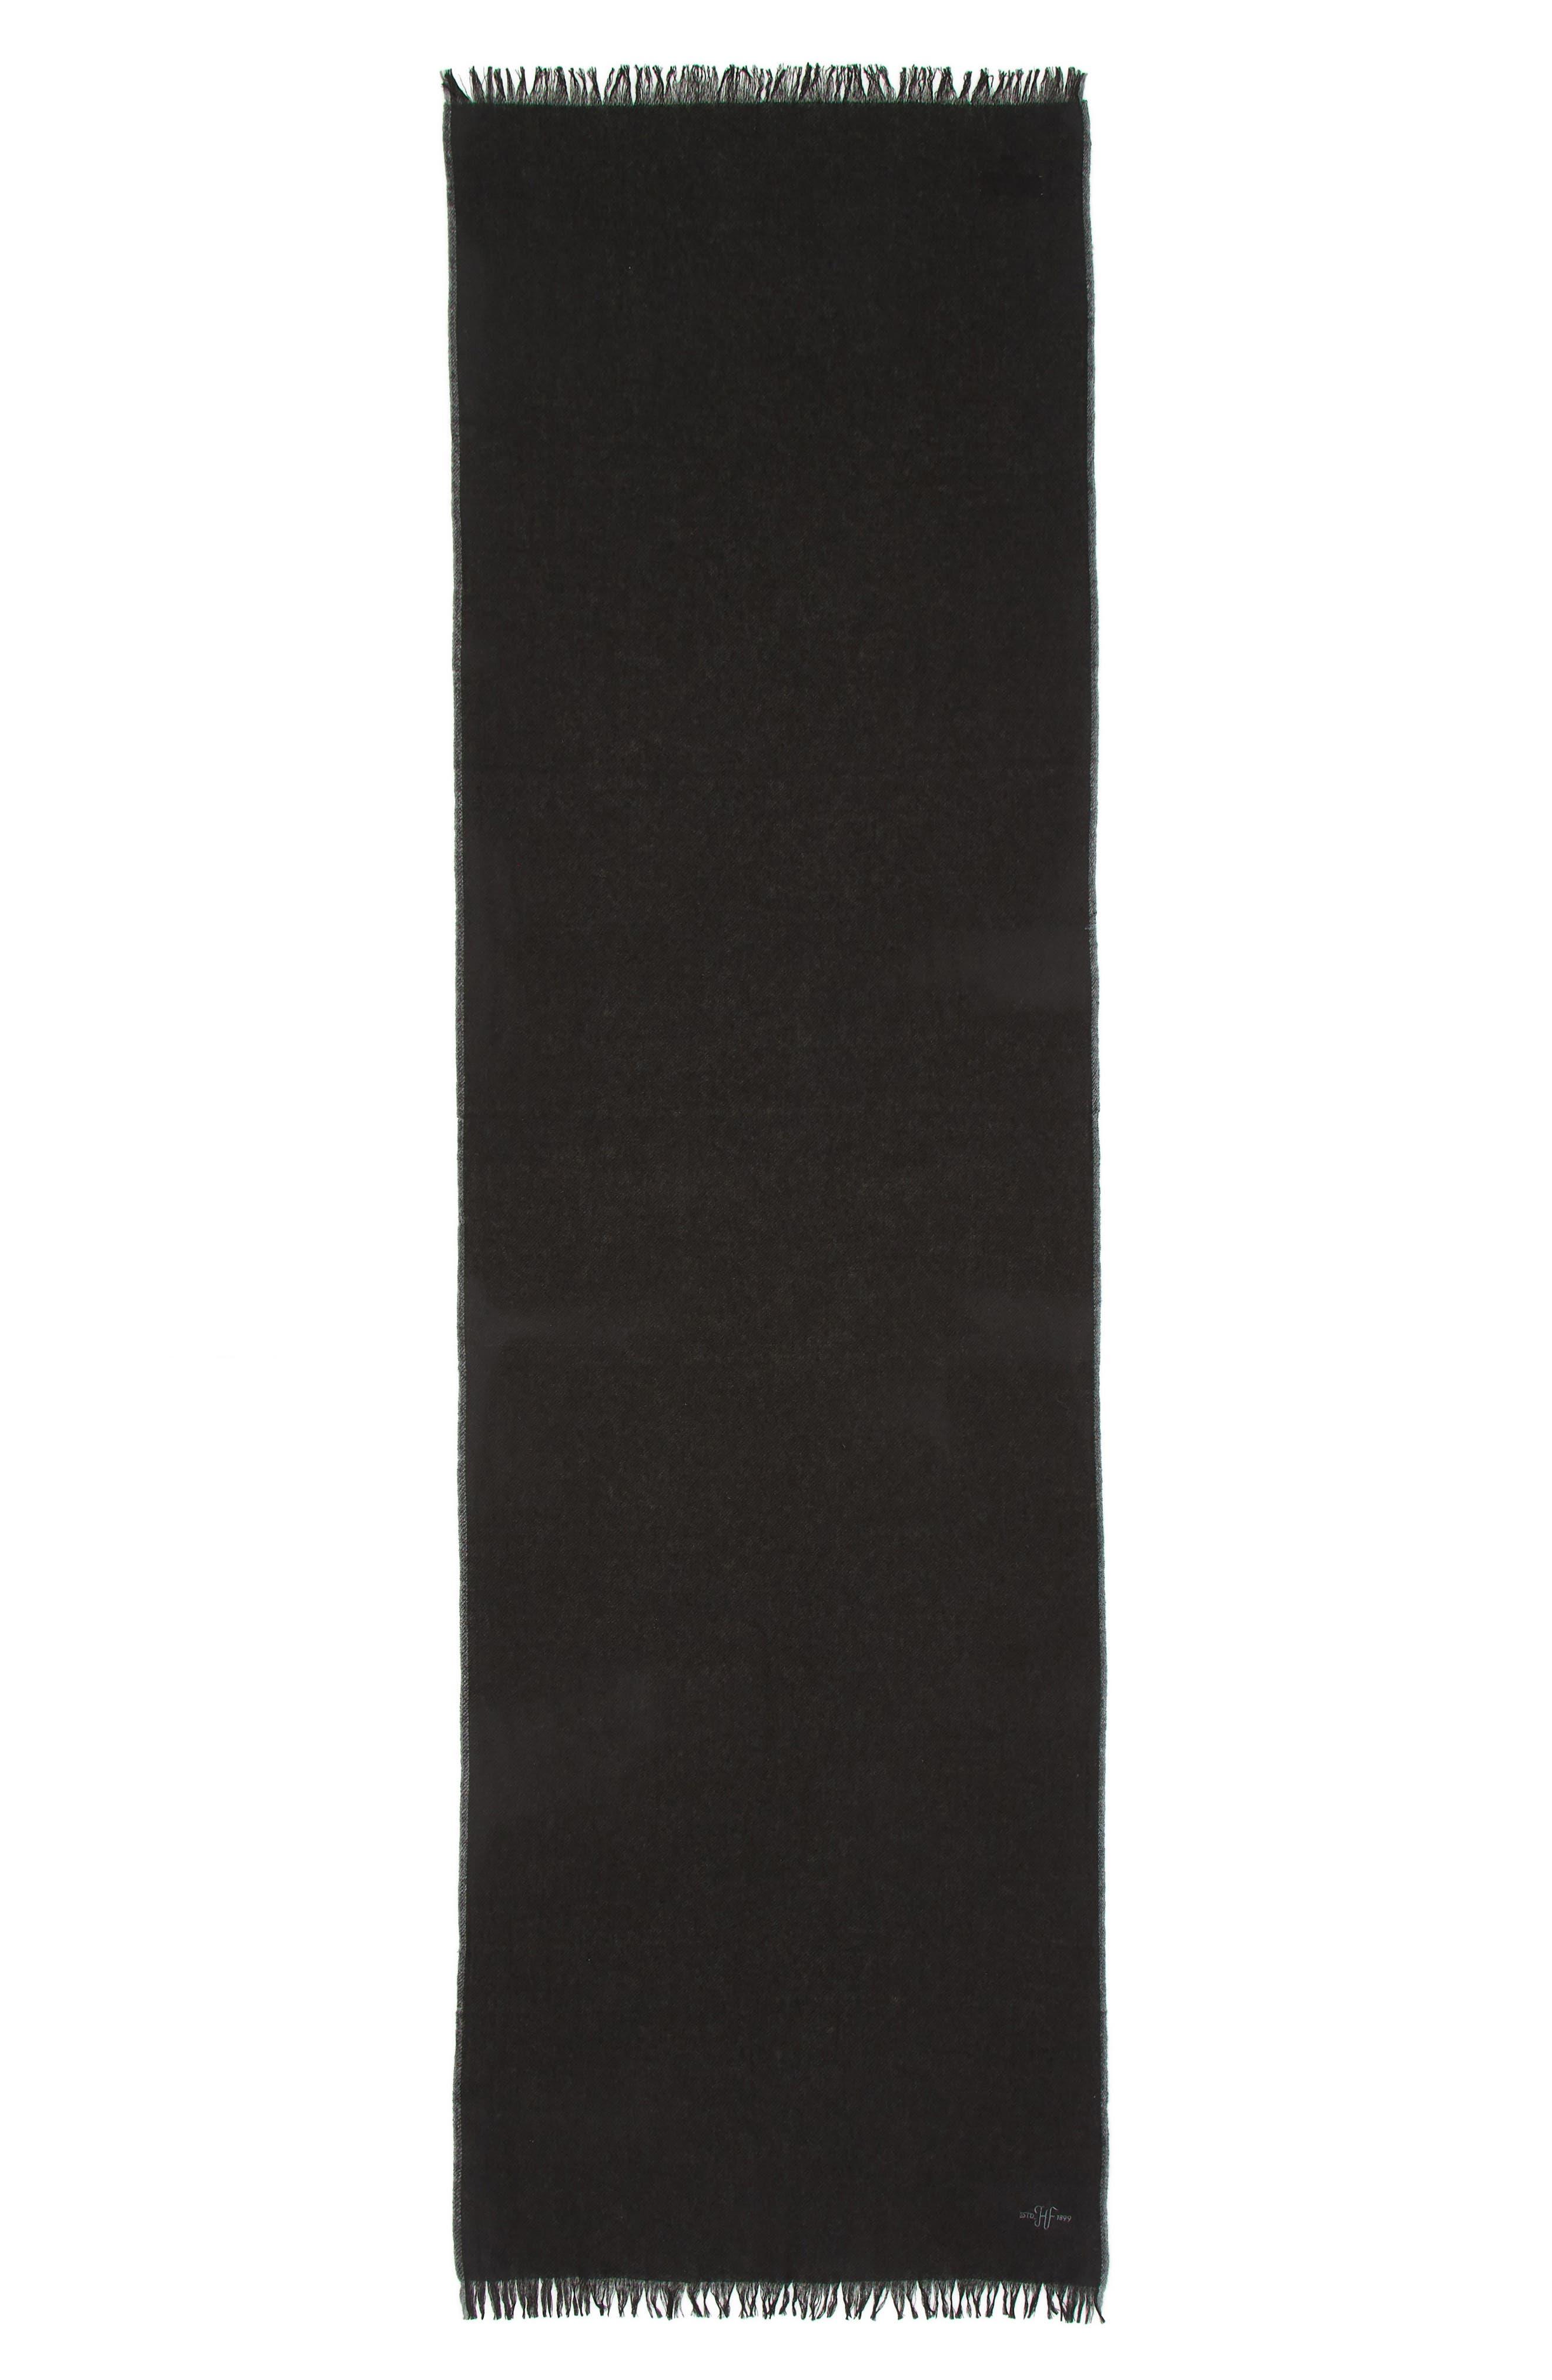 Cashmere Scarf,                             Alternate thumbnail 2, color,                             BLACK/ GREY